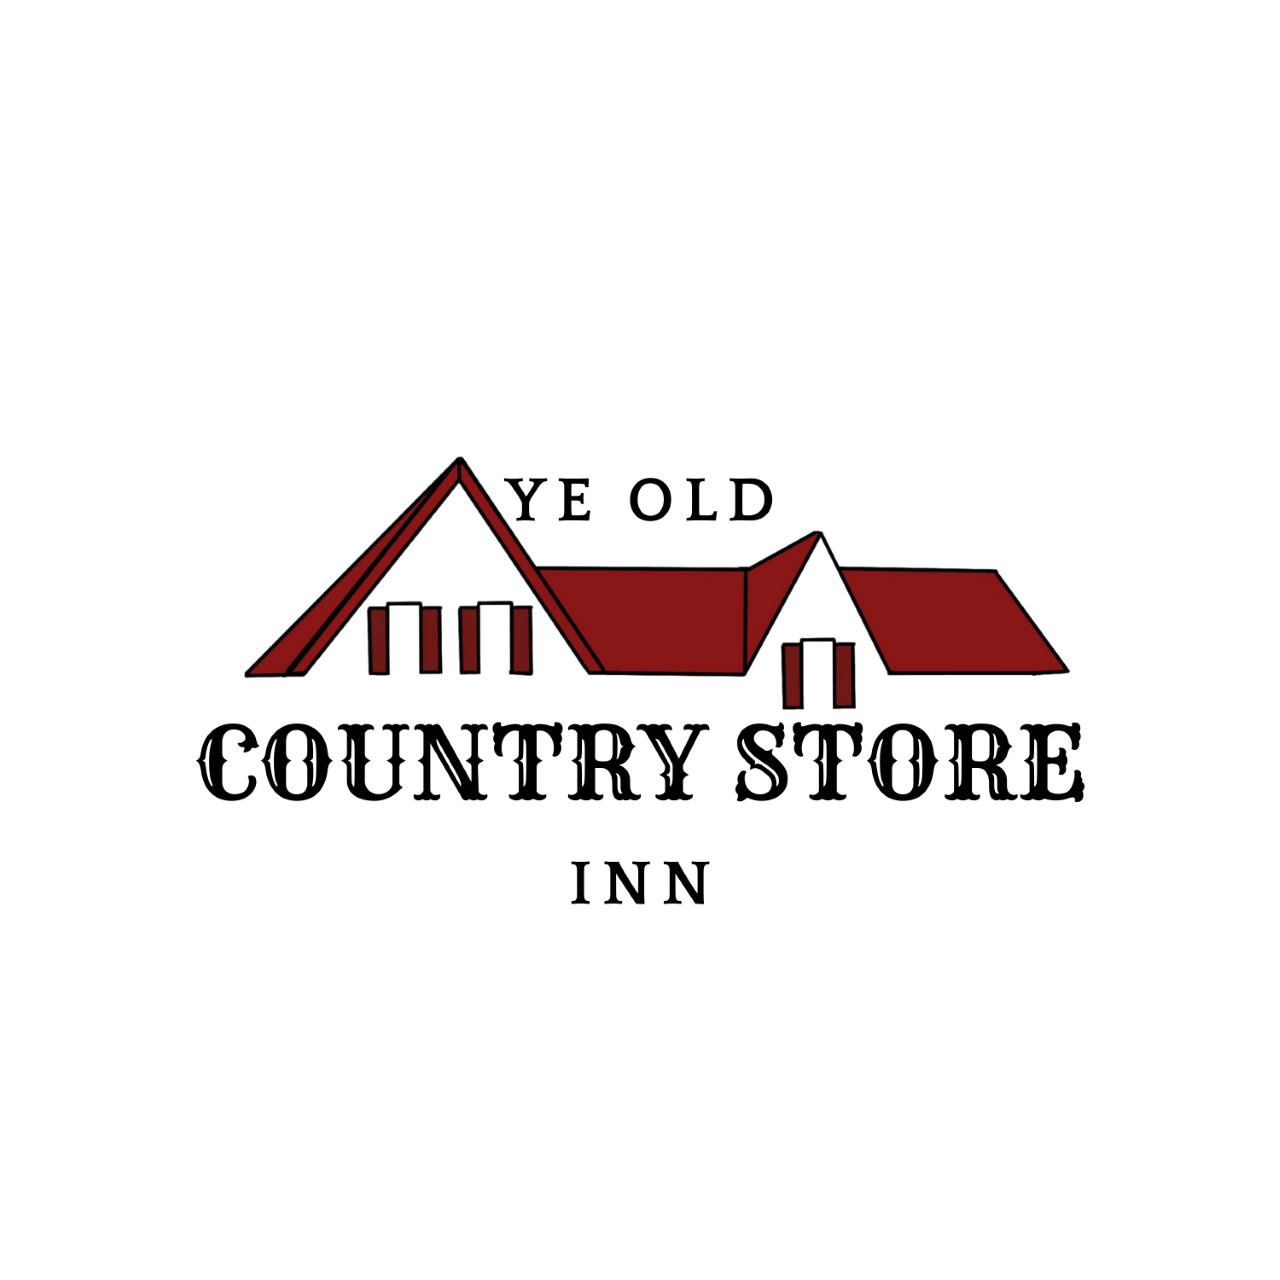 YE OLD COUNTRY STORE INN